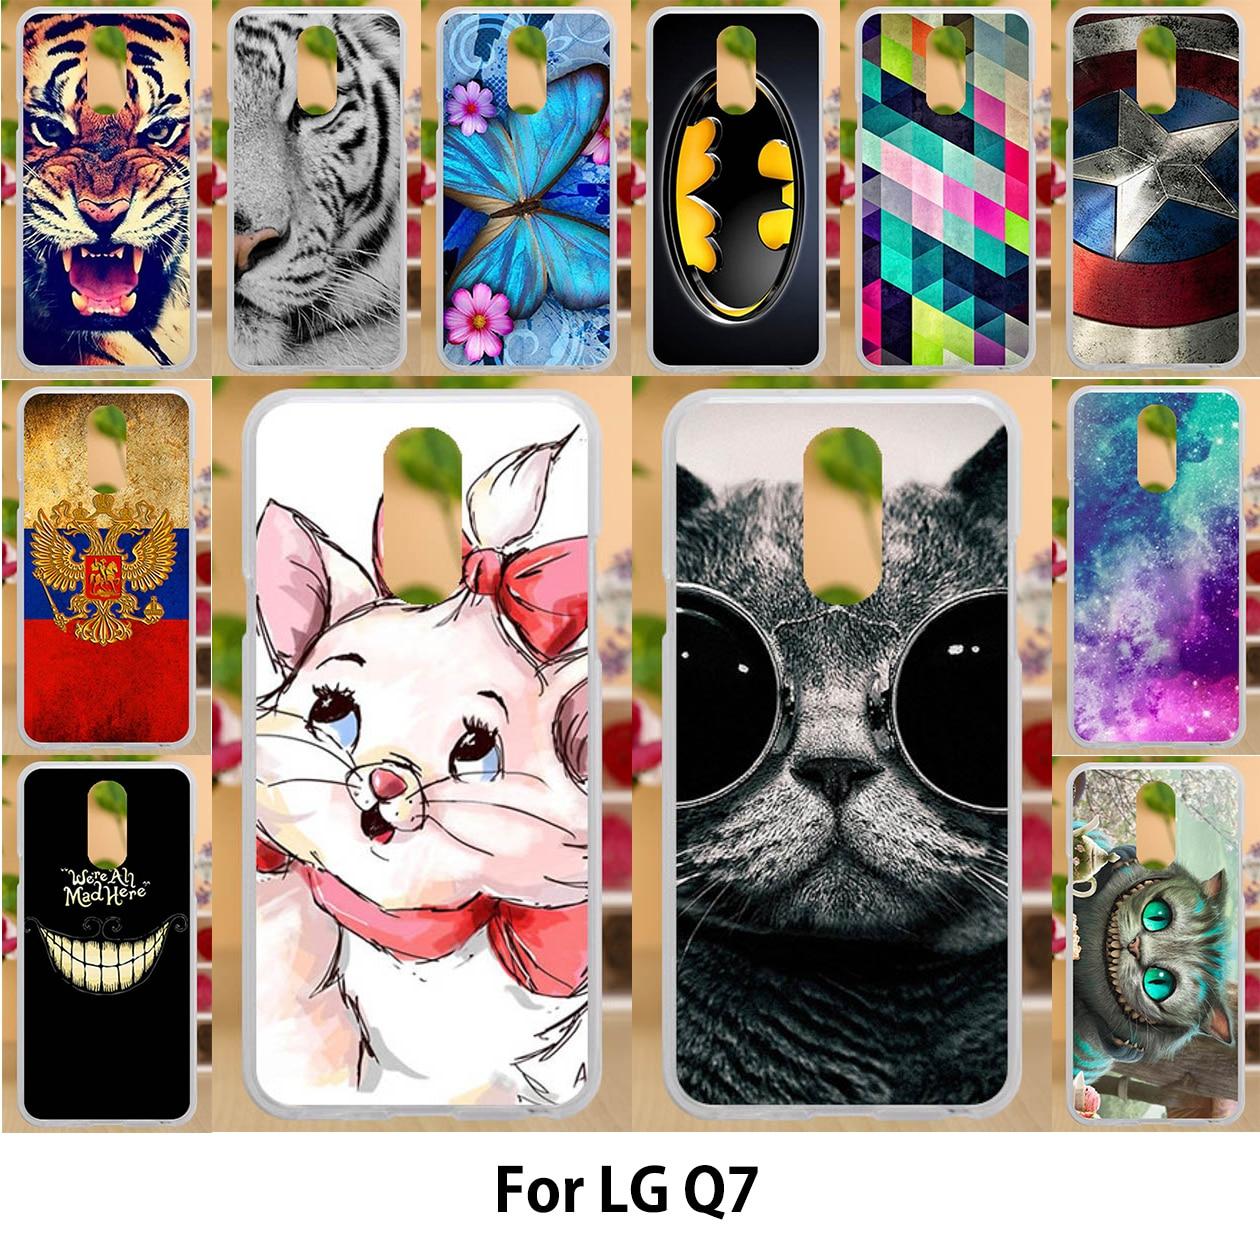 Funda Anunob para LG Q7 casos TPU de silicona suave de 5,5 pulgadas para LG Q7 más Q7 alfa LG estilo/L-03K cubre soleado sonrisa pintura